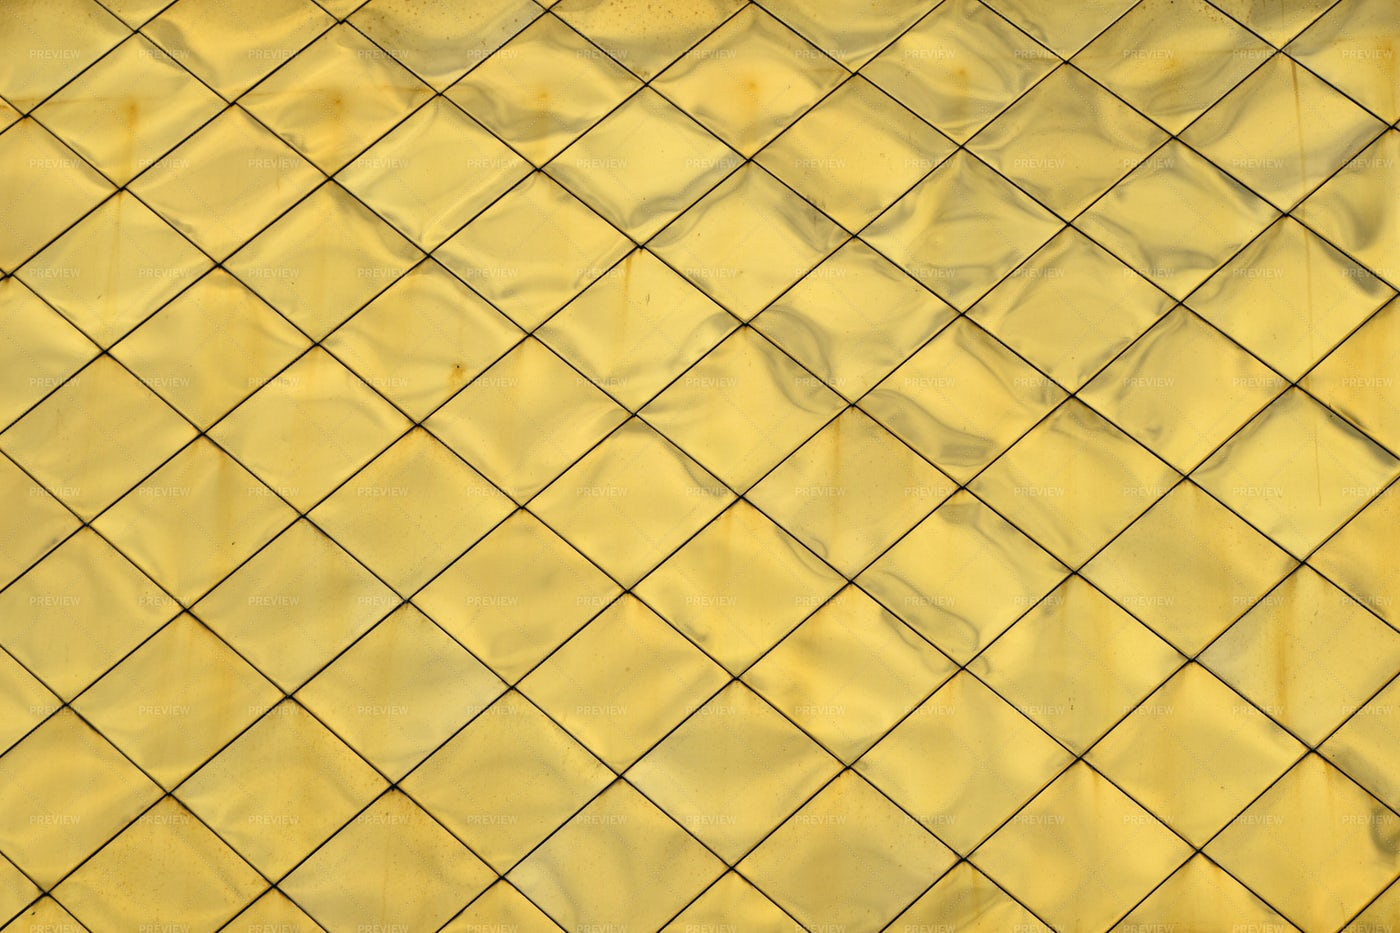 Golden Metal Roof Tiles: Stock Photos